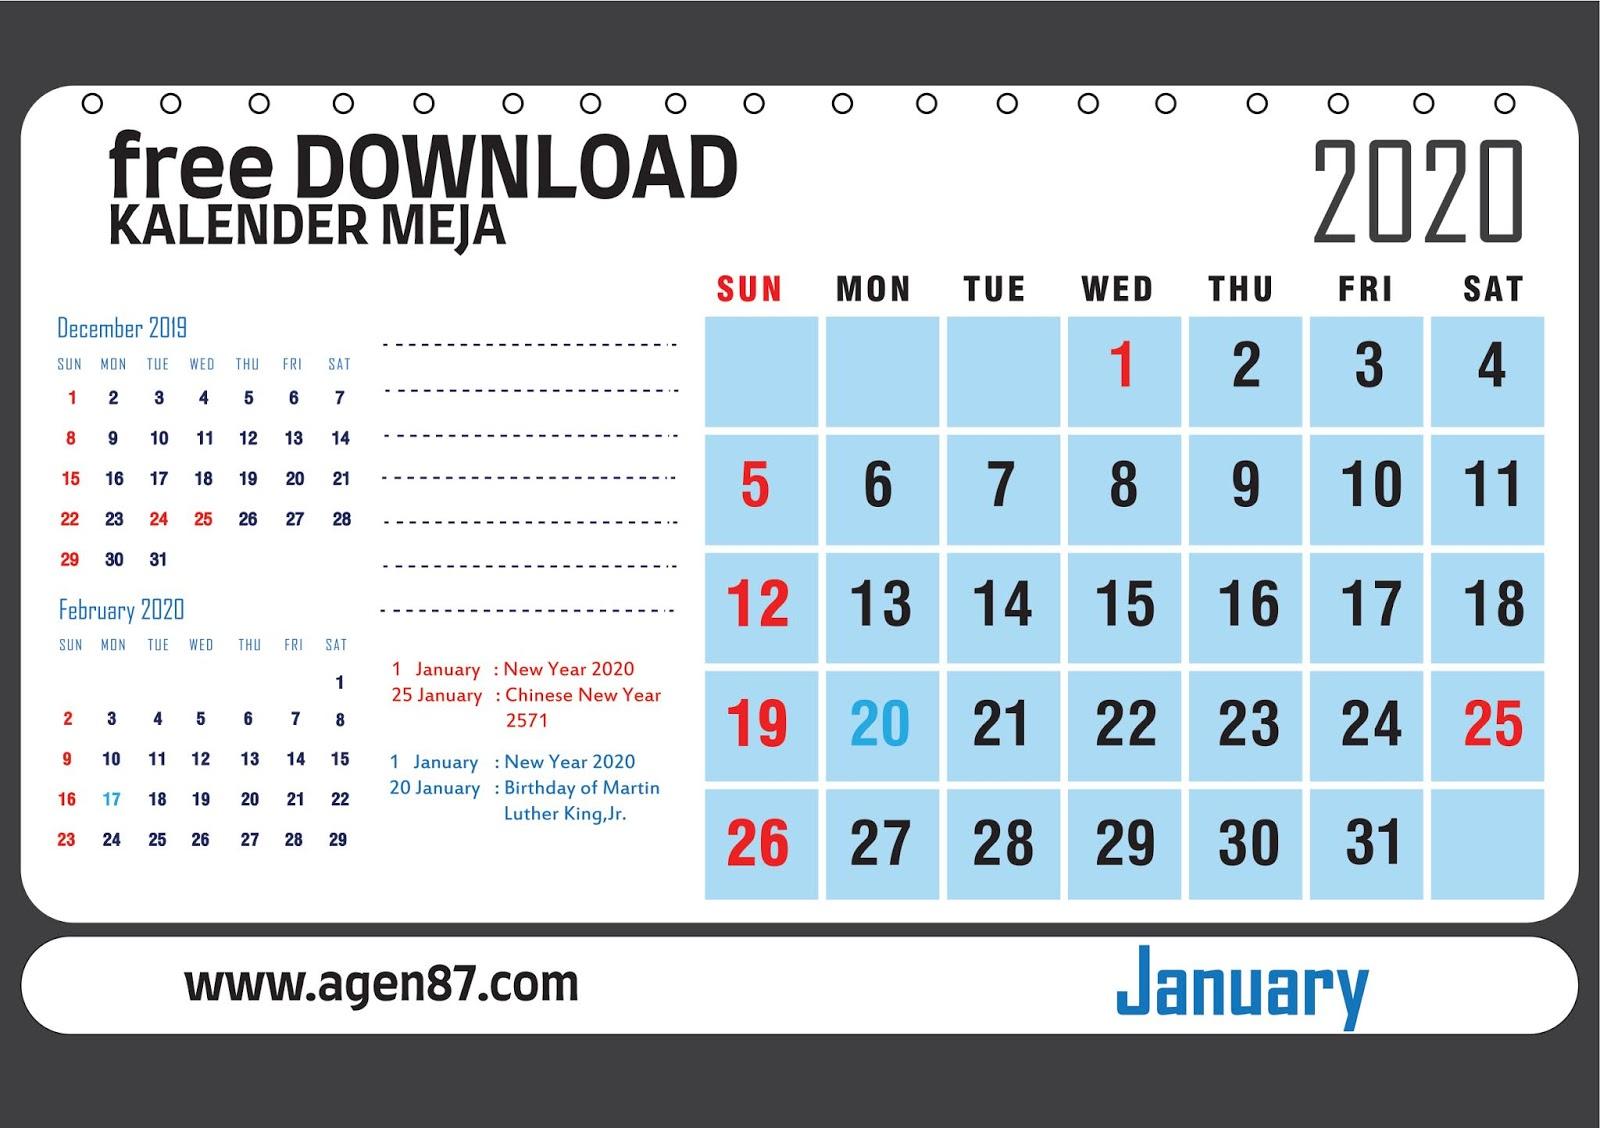 Template Desain Kalender Duduk - Contoh Gambar Template